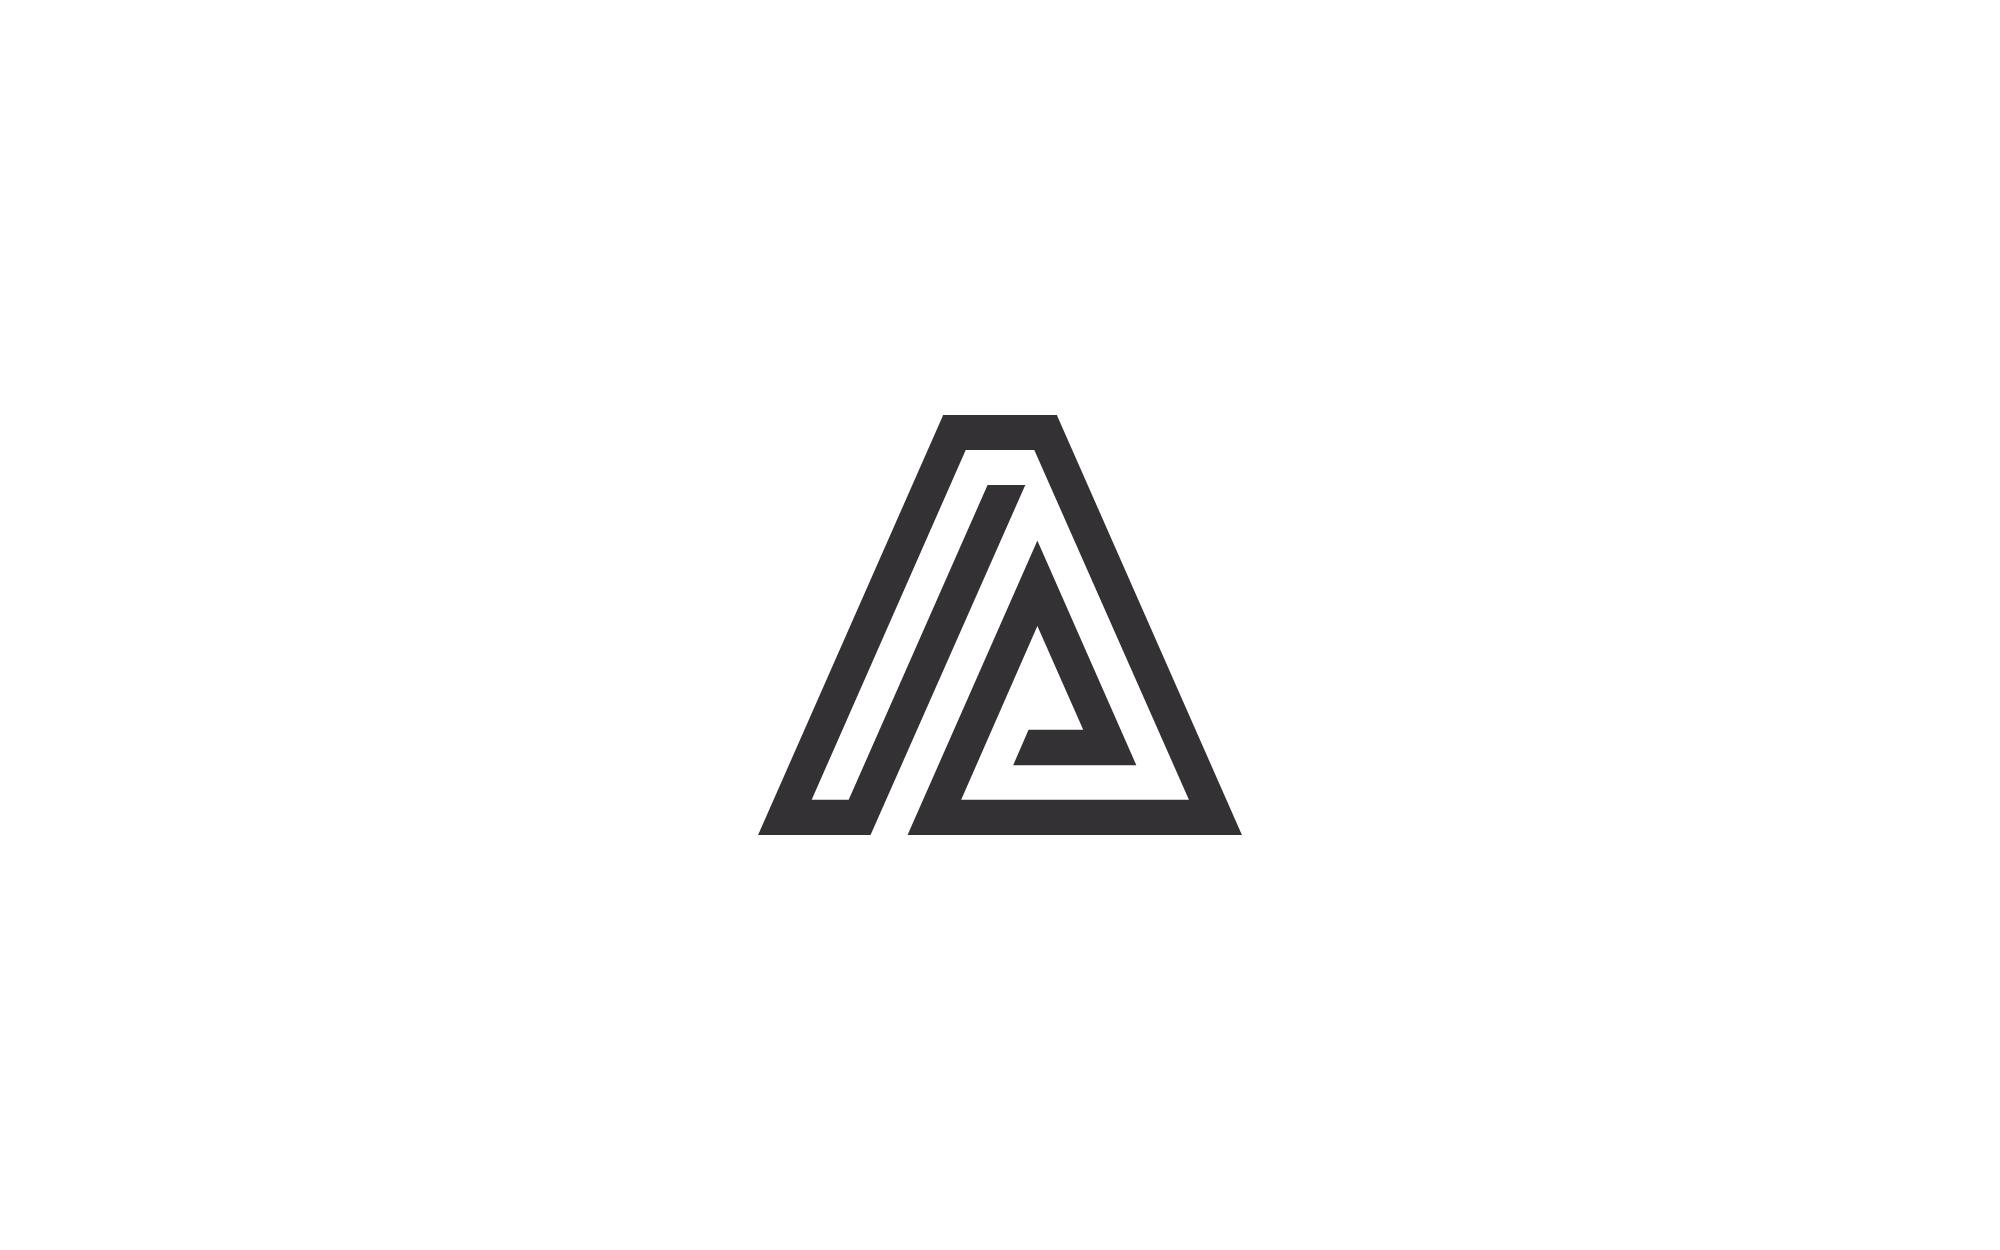 air_logo_branding_design_matthew_pomorski_graphic_designer_kent